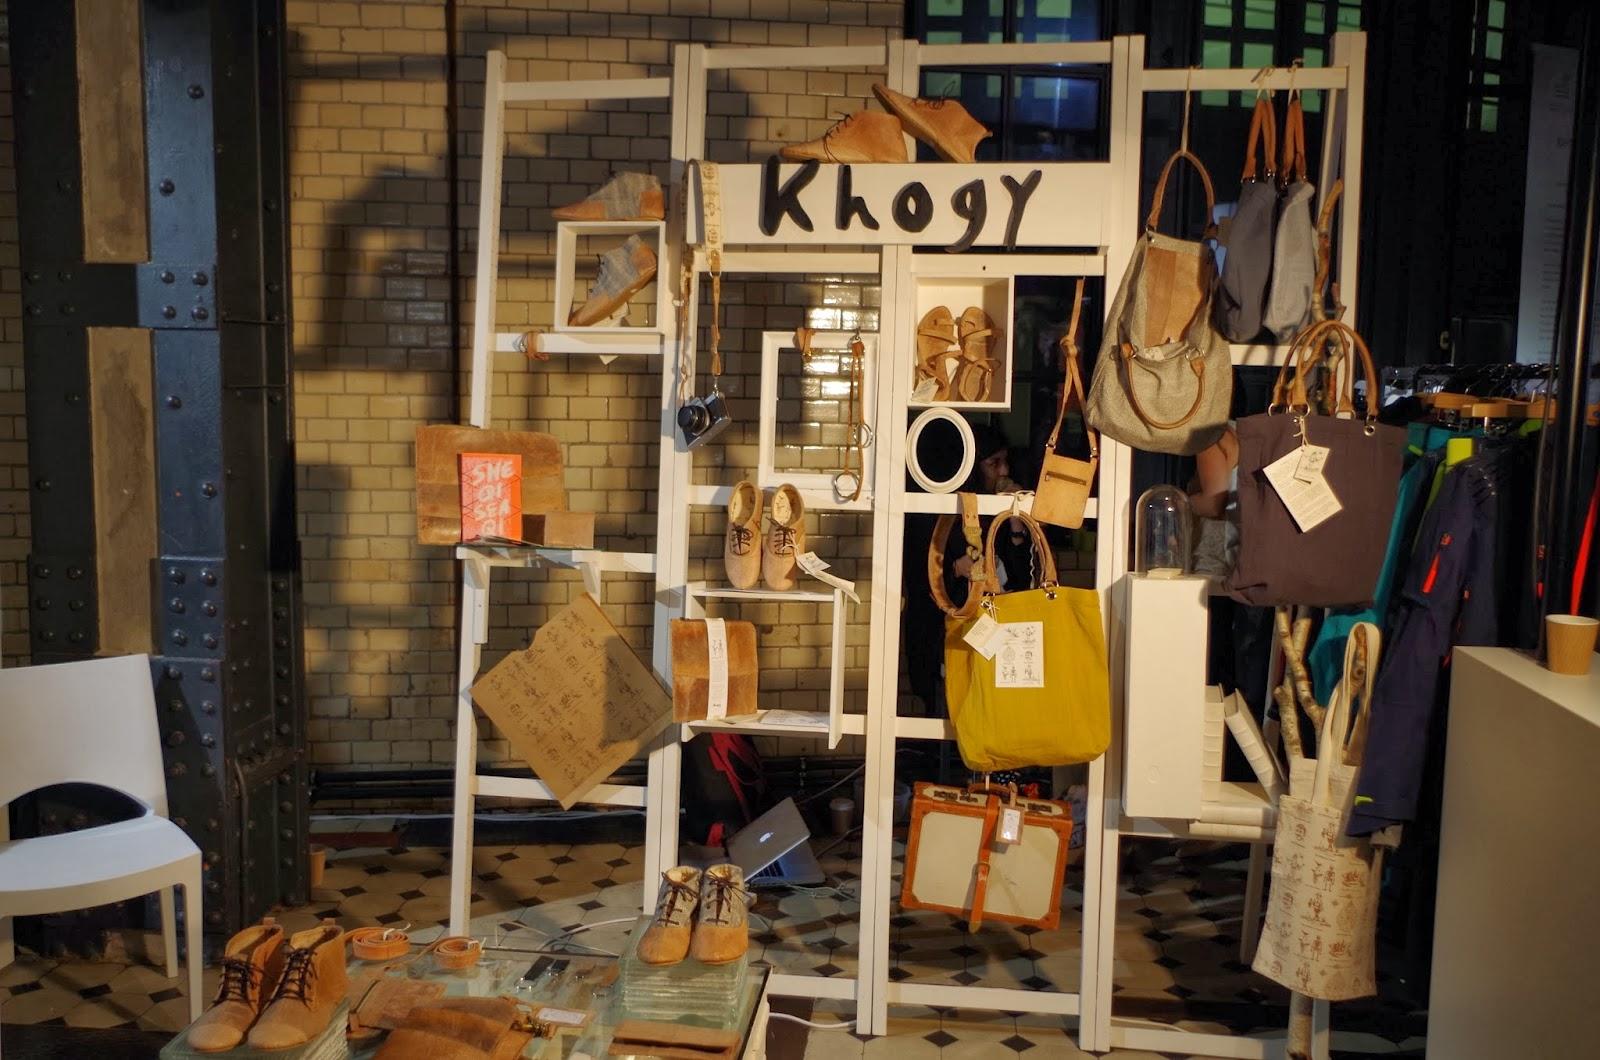 ethical_fashion_show_aw_14_khogy.JPG